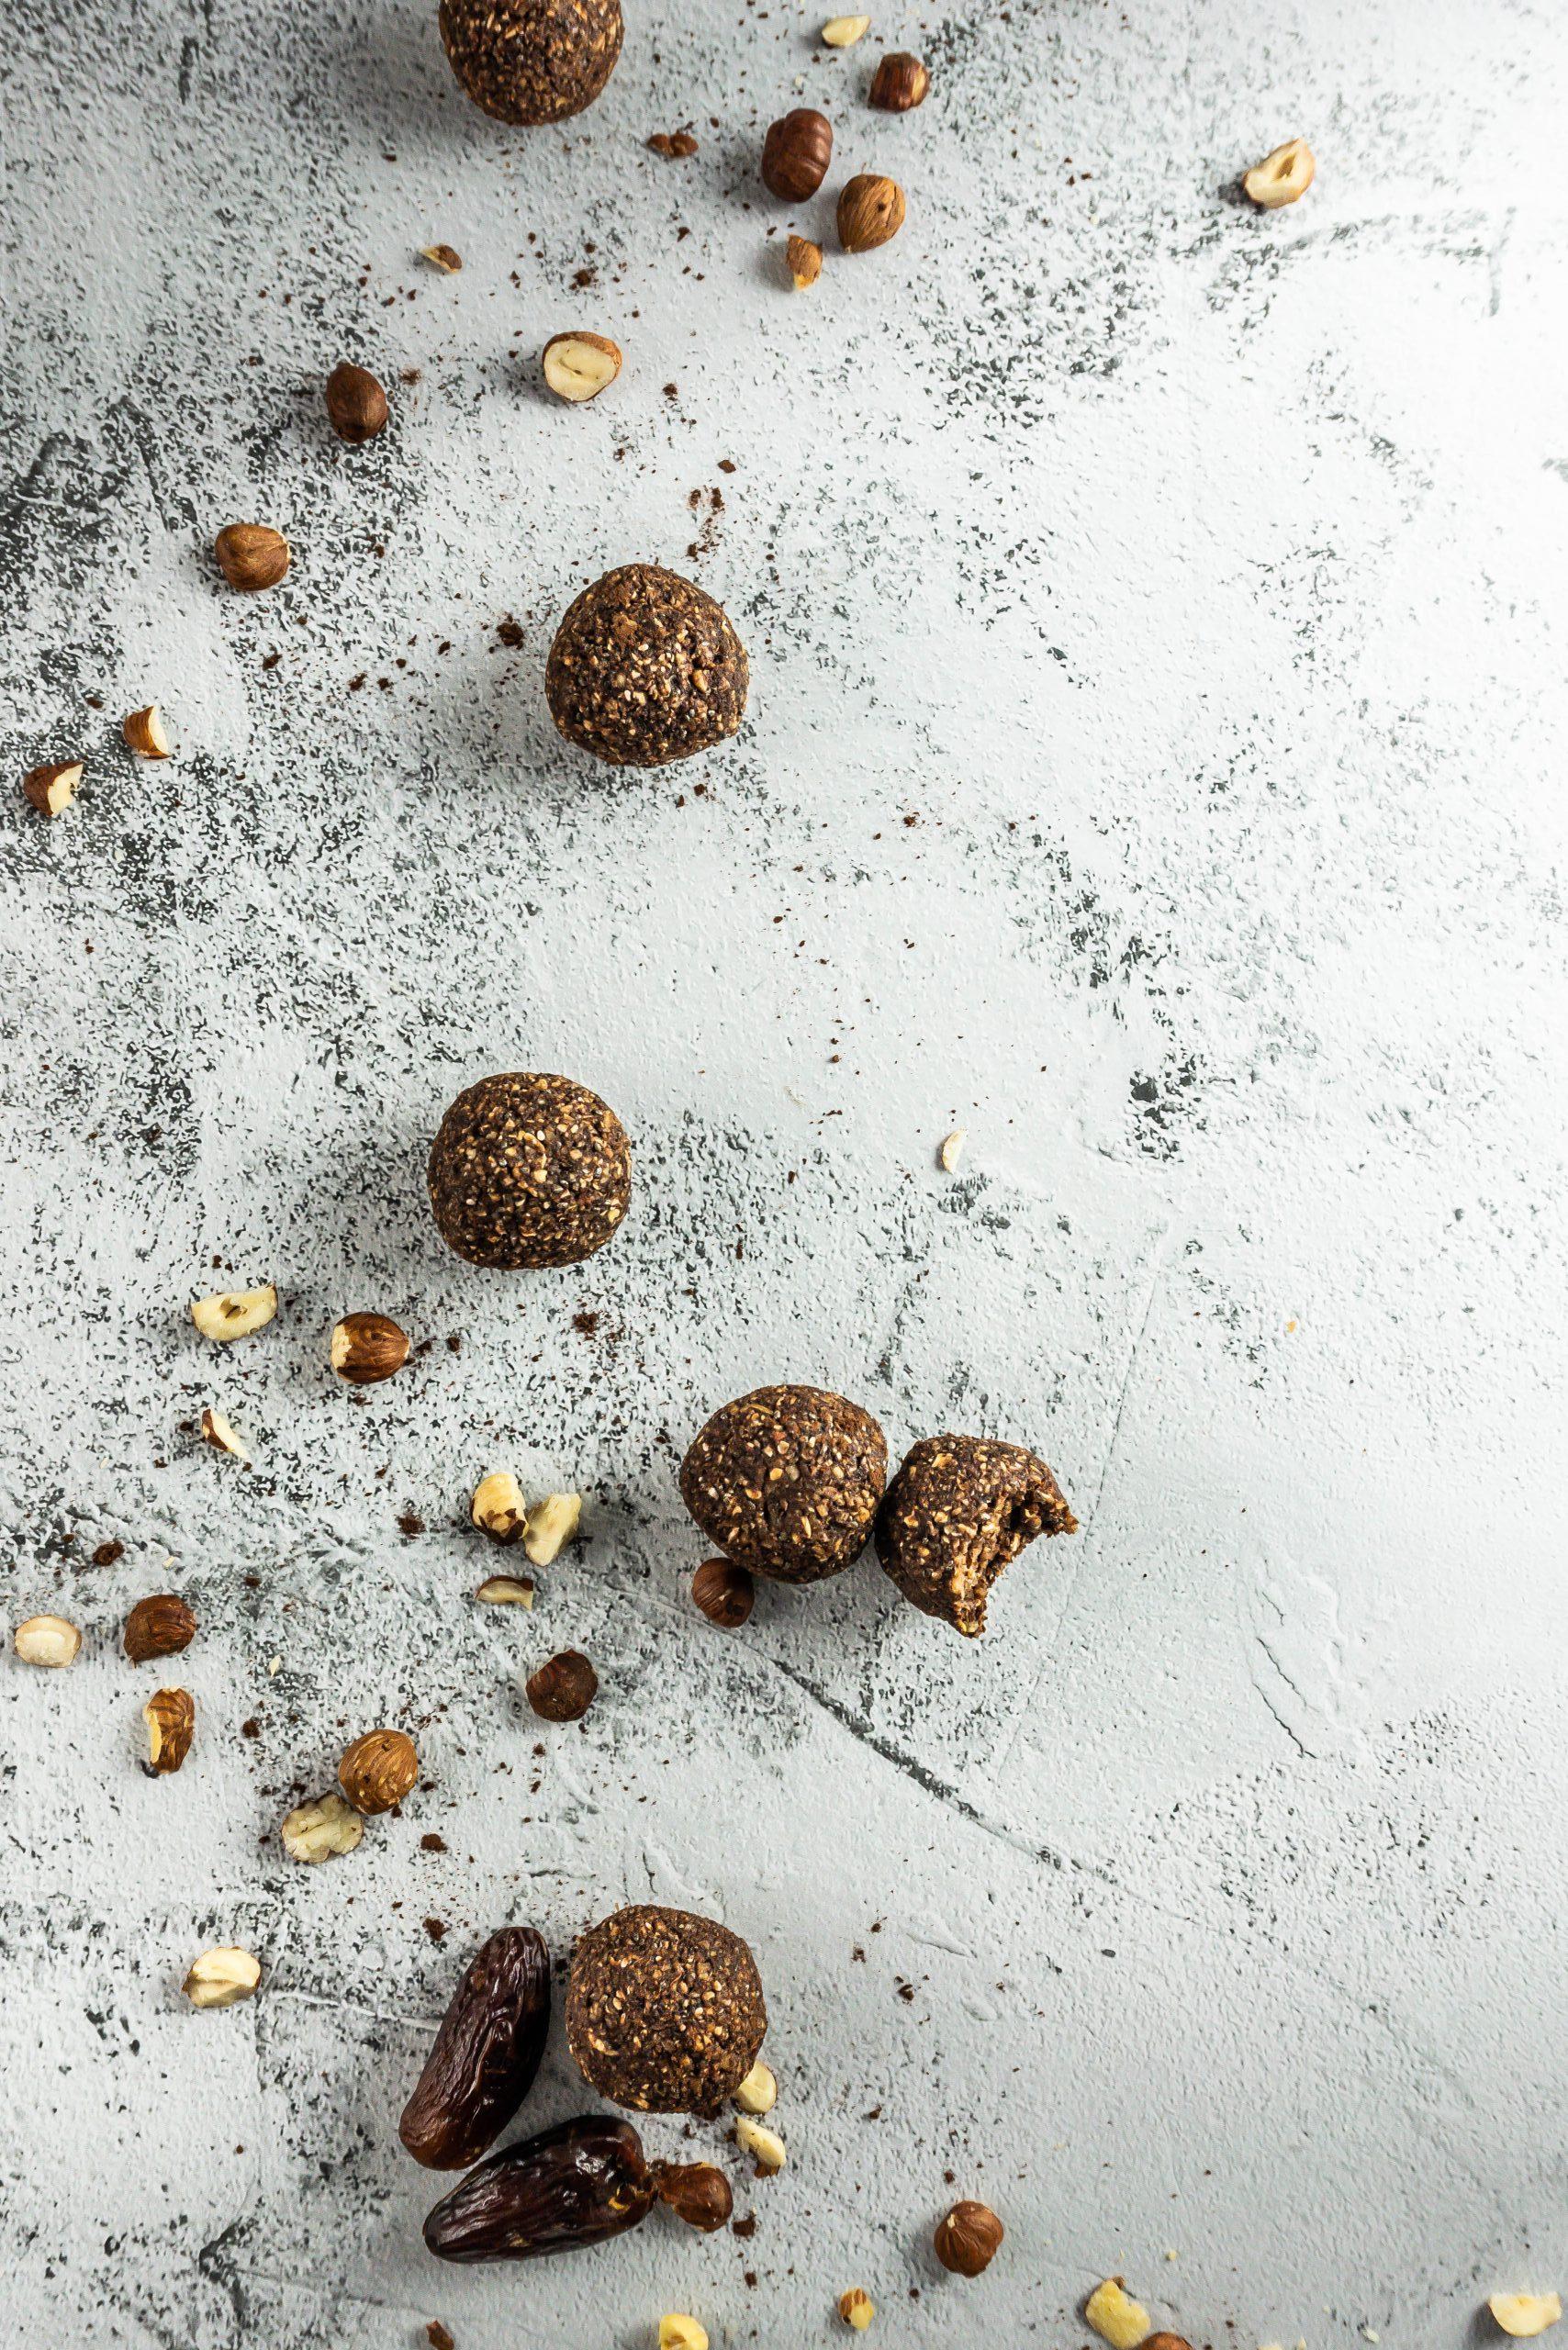 Chocolate Hazelnut Energy Balls on a concrete background with chopped hazelnuts lying around